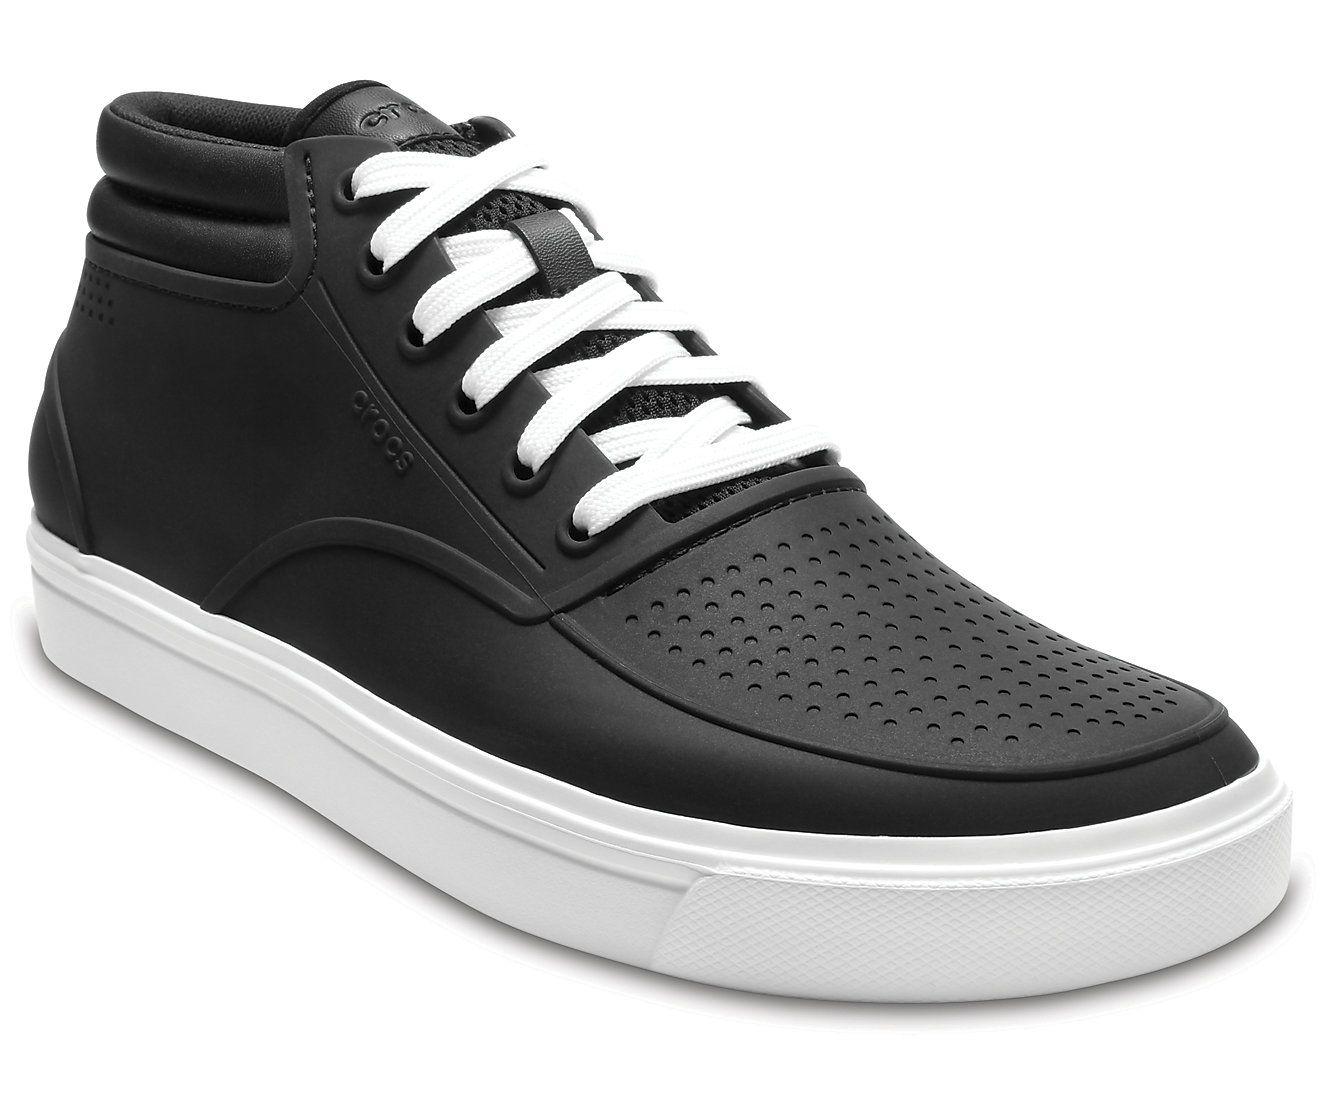 Crocs Black Chukka boot